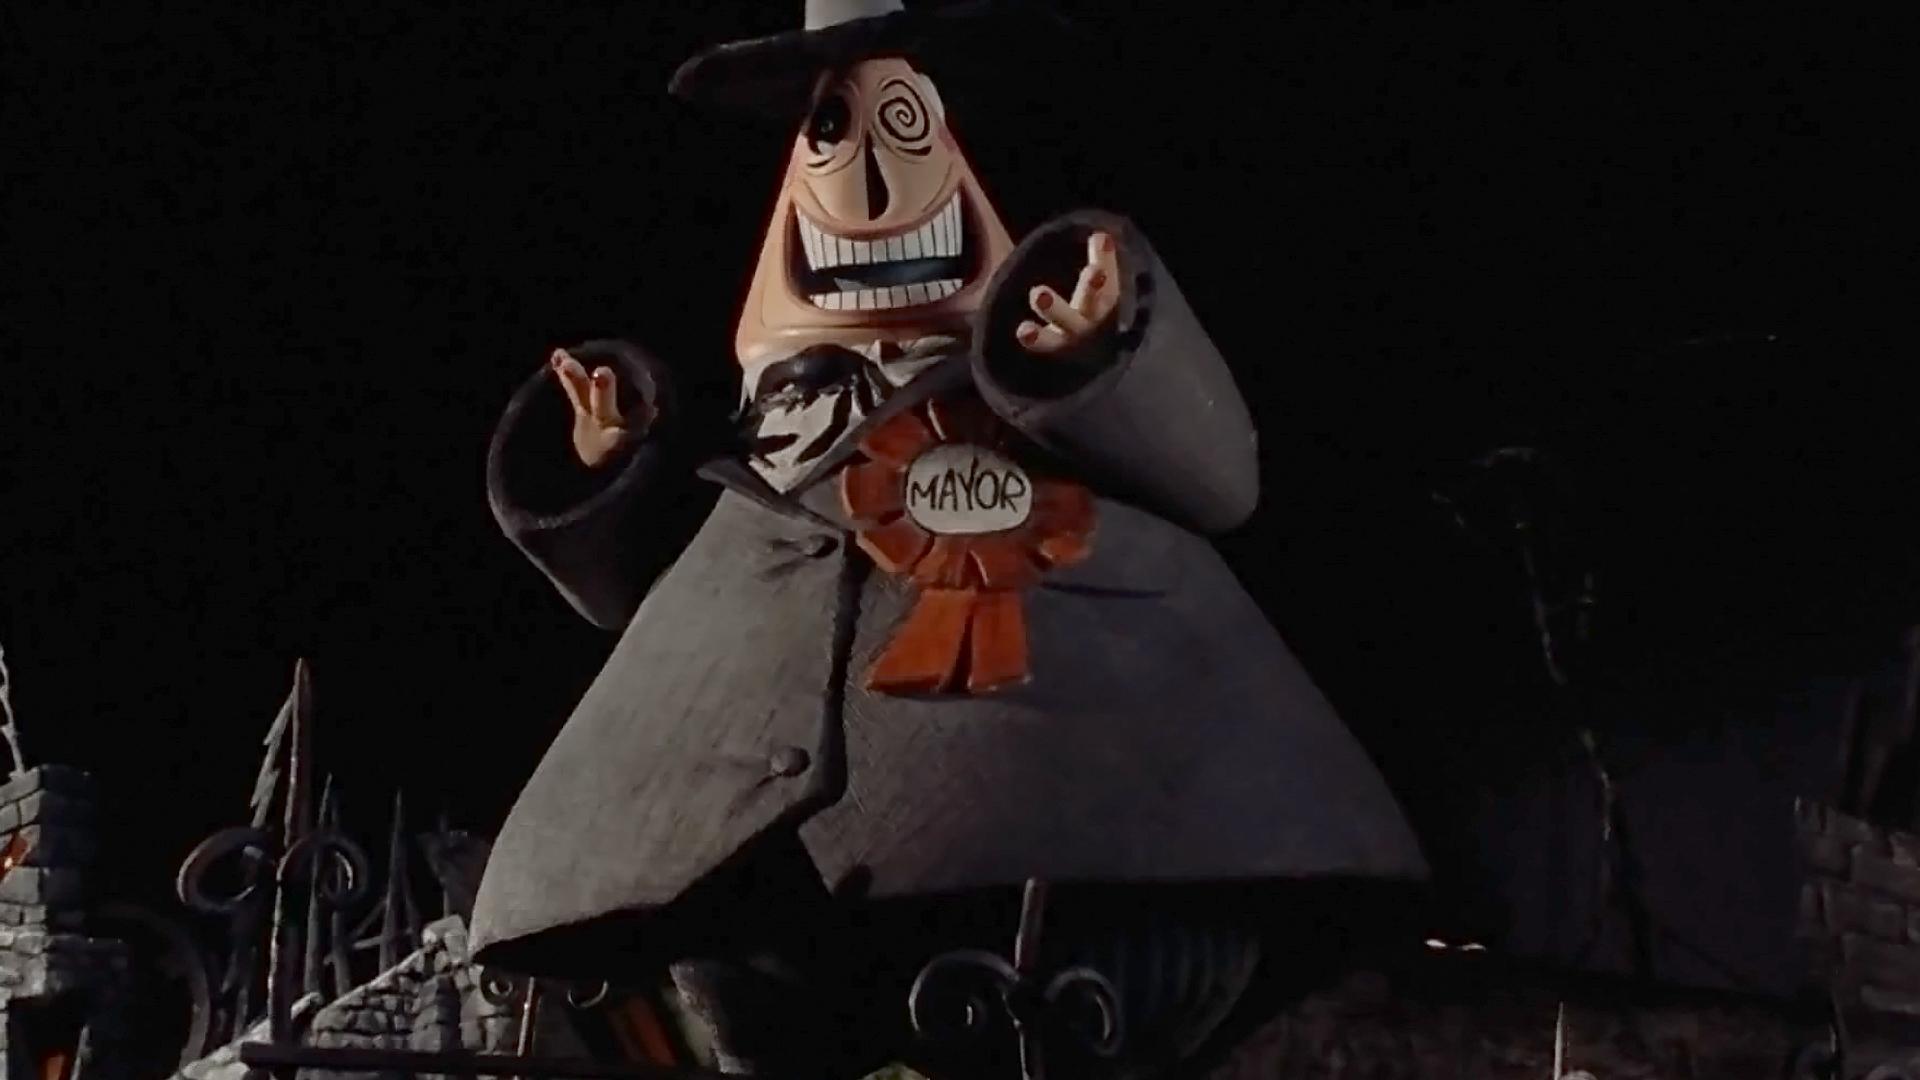 the mayor of halloweentown nightmare before christmas wallpaper